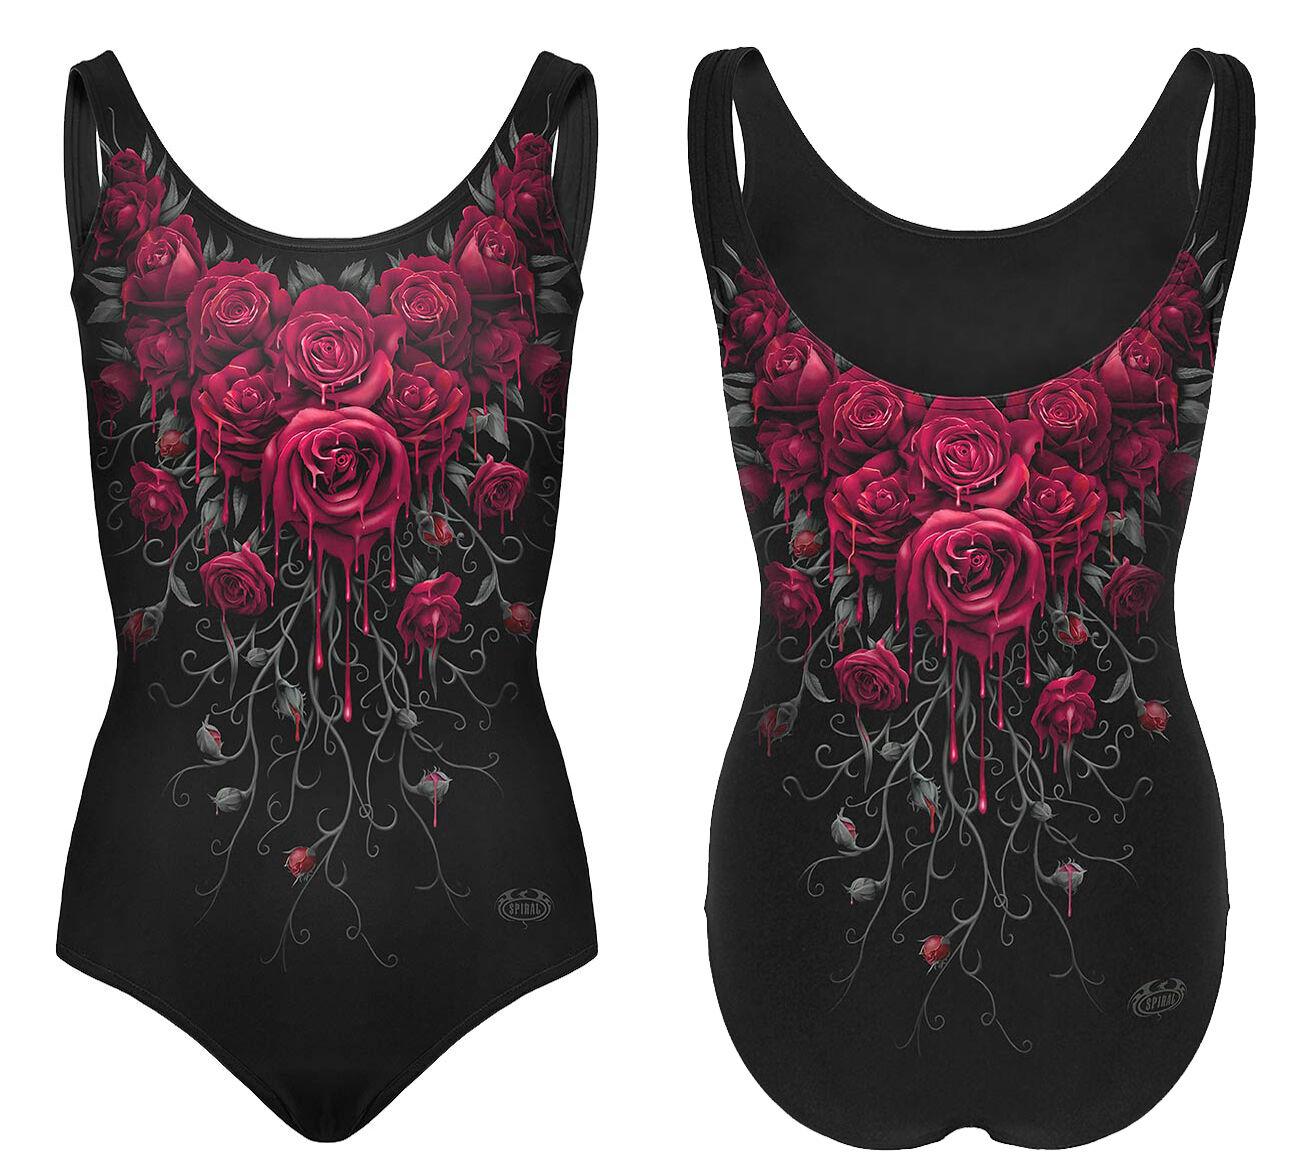 Spiral direct Noir swimsuit / / / Crâne / Roses / cat / TRIBAL / GOTH / Chaton Squelette / / DRAGON f27e7b